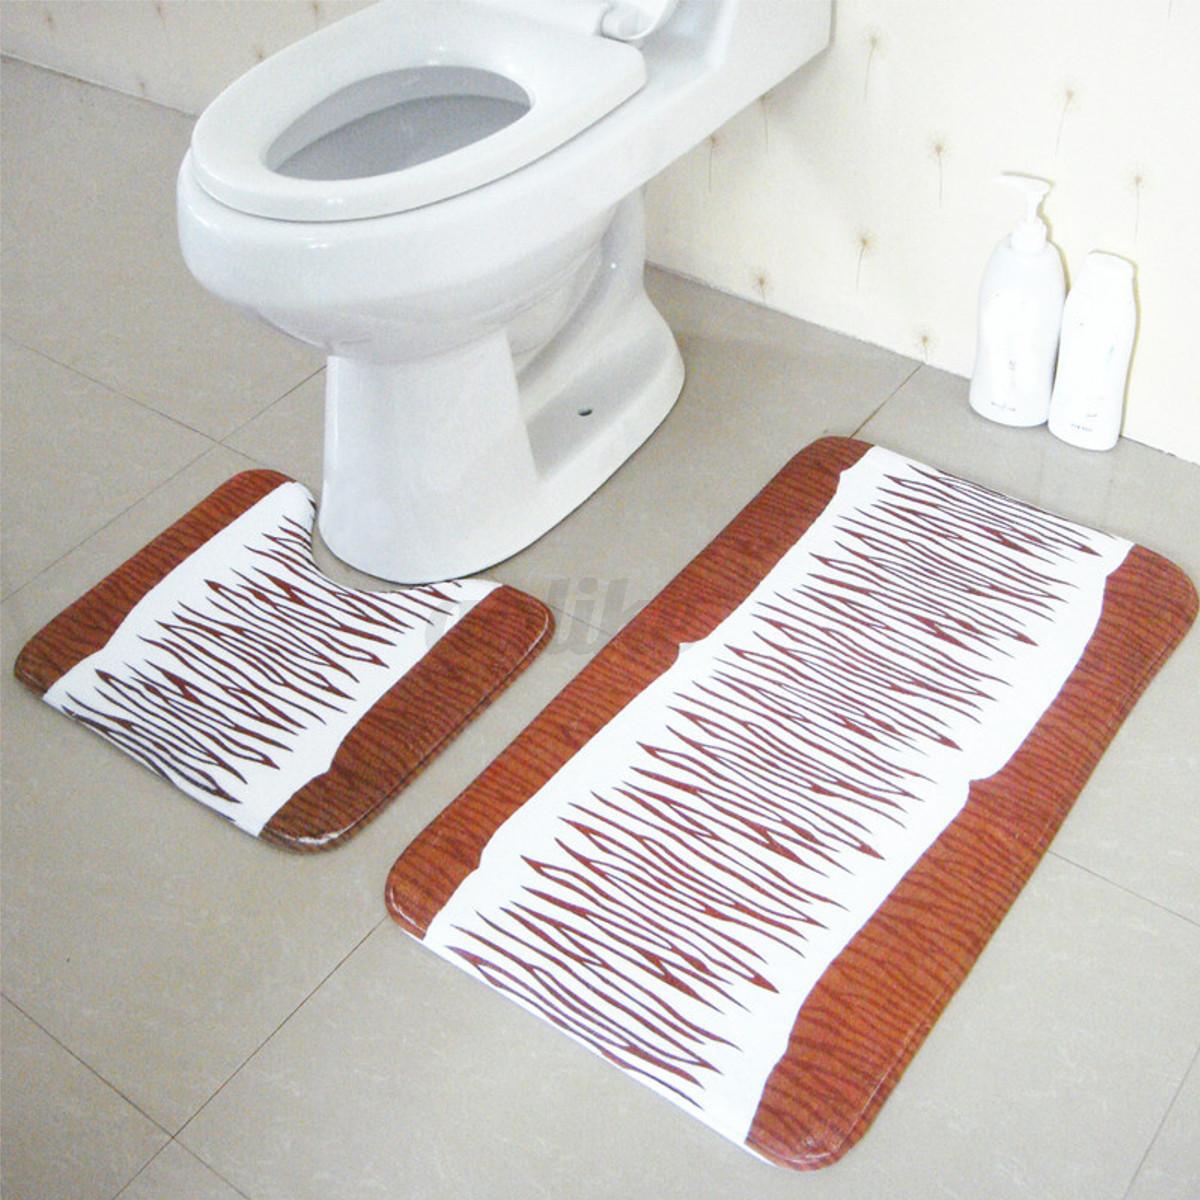 2pcs Set Floor Rug Carpet Bath Pedestal Mat Bathroom Shower Toilet Non Slip P